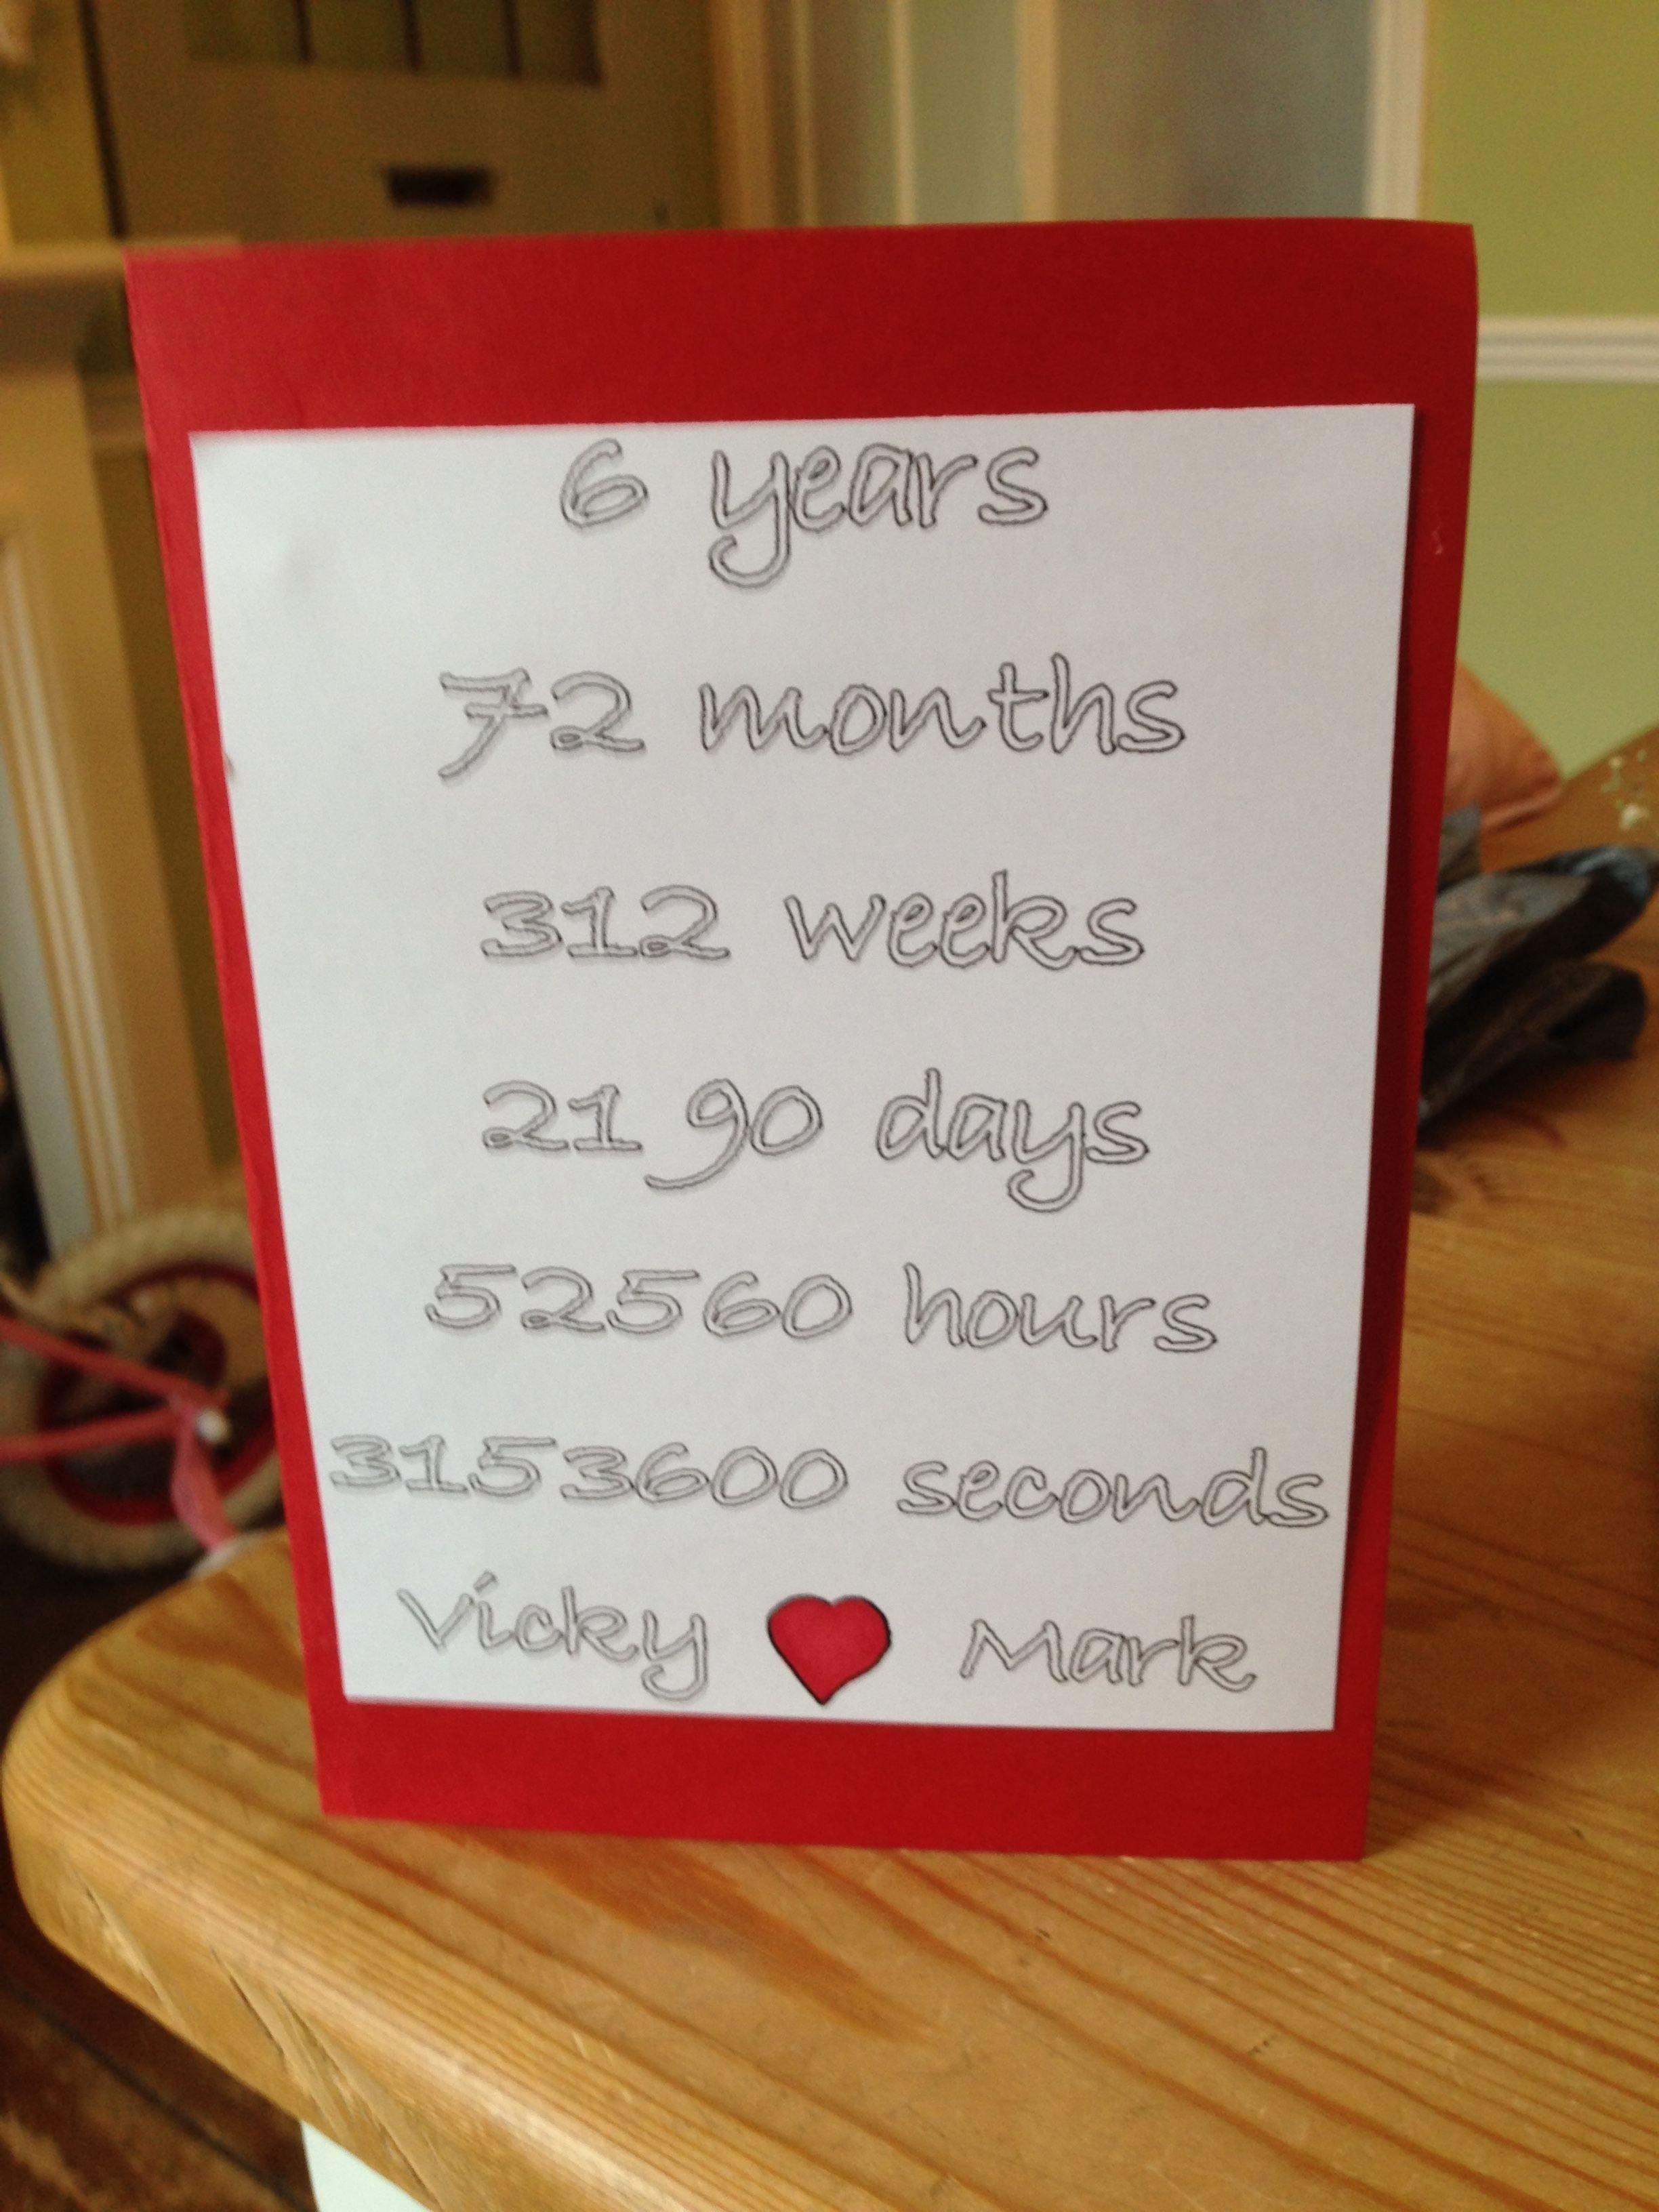 6 year anniversary card | love it | pinterest | anniversaries, gift